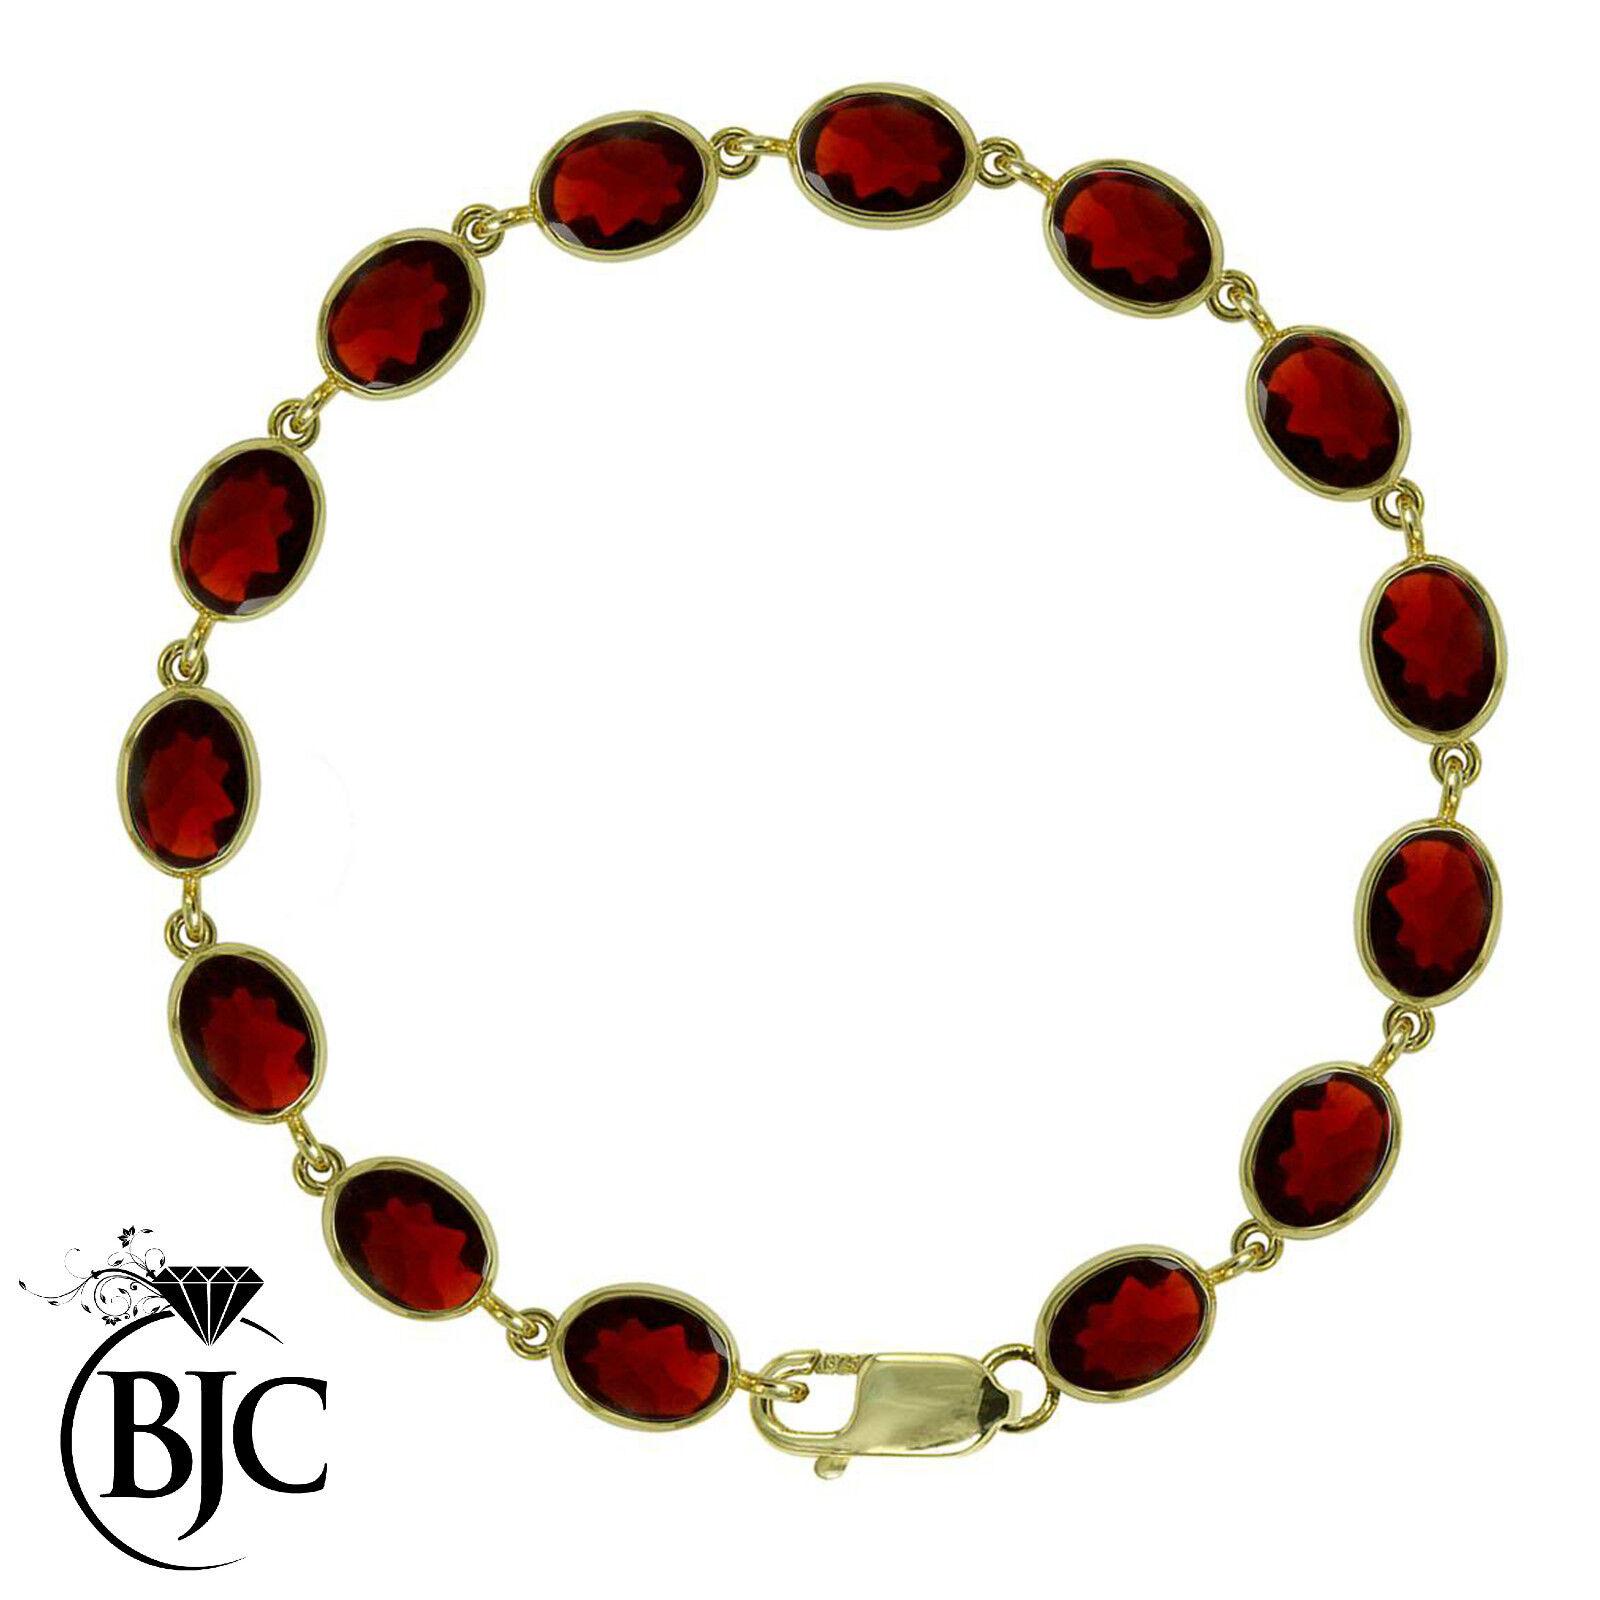 BJC® 9ct Yellow gold Natural Garnet 21.00ct Oval Gemstone Tennis Bracelet 7.5